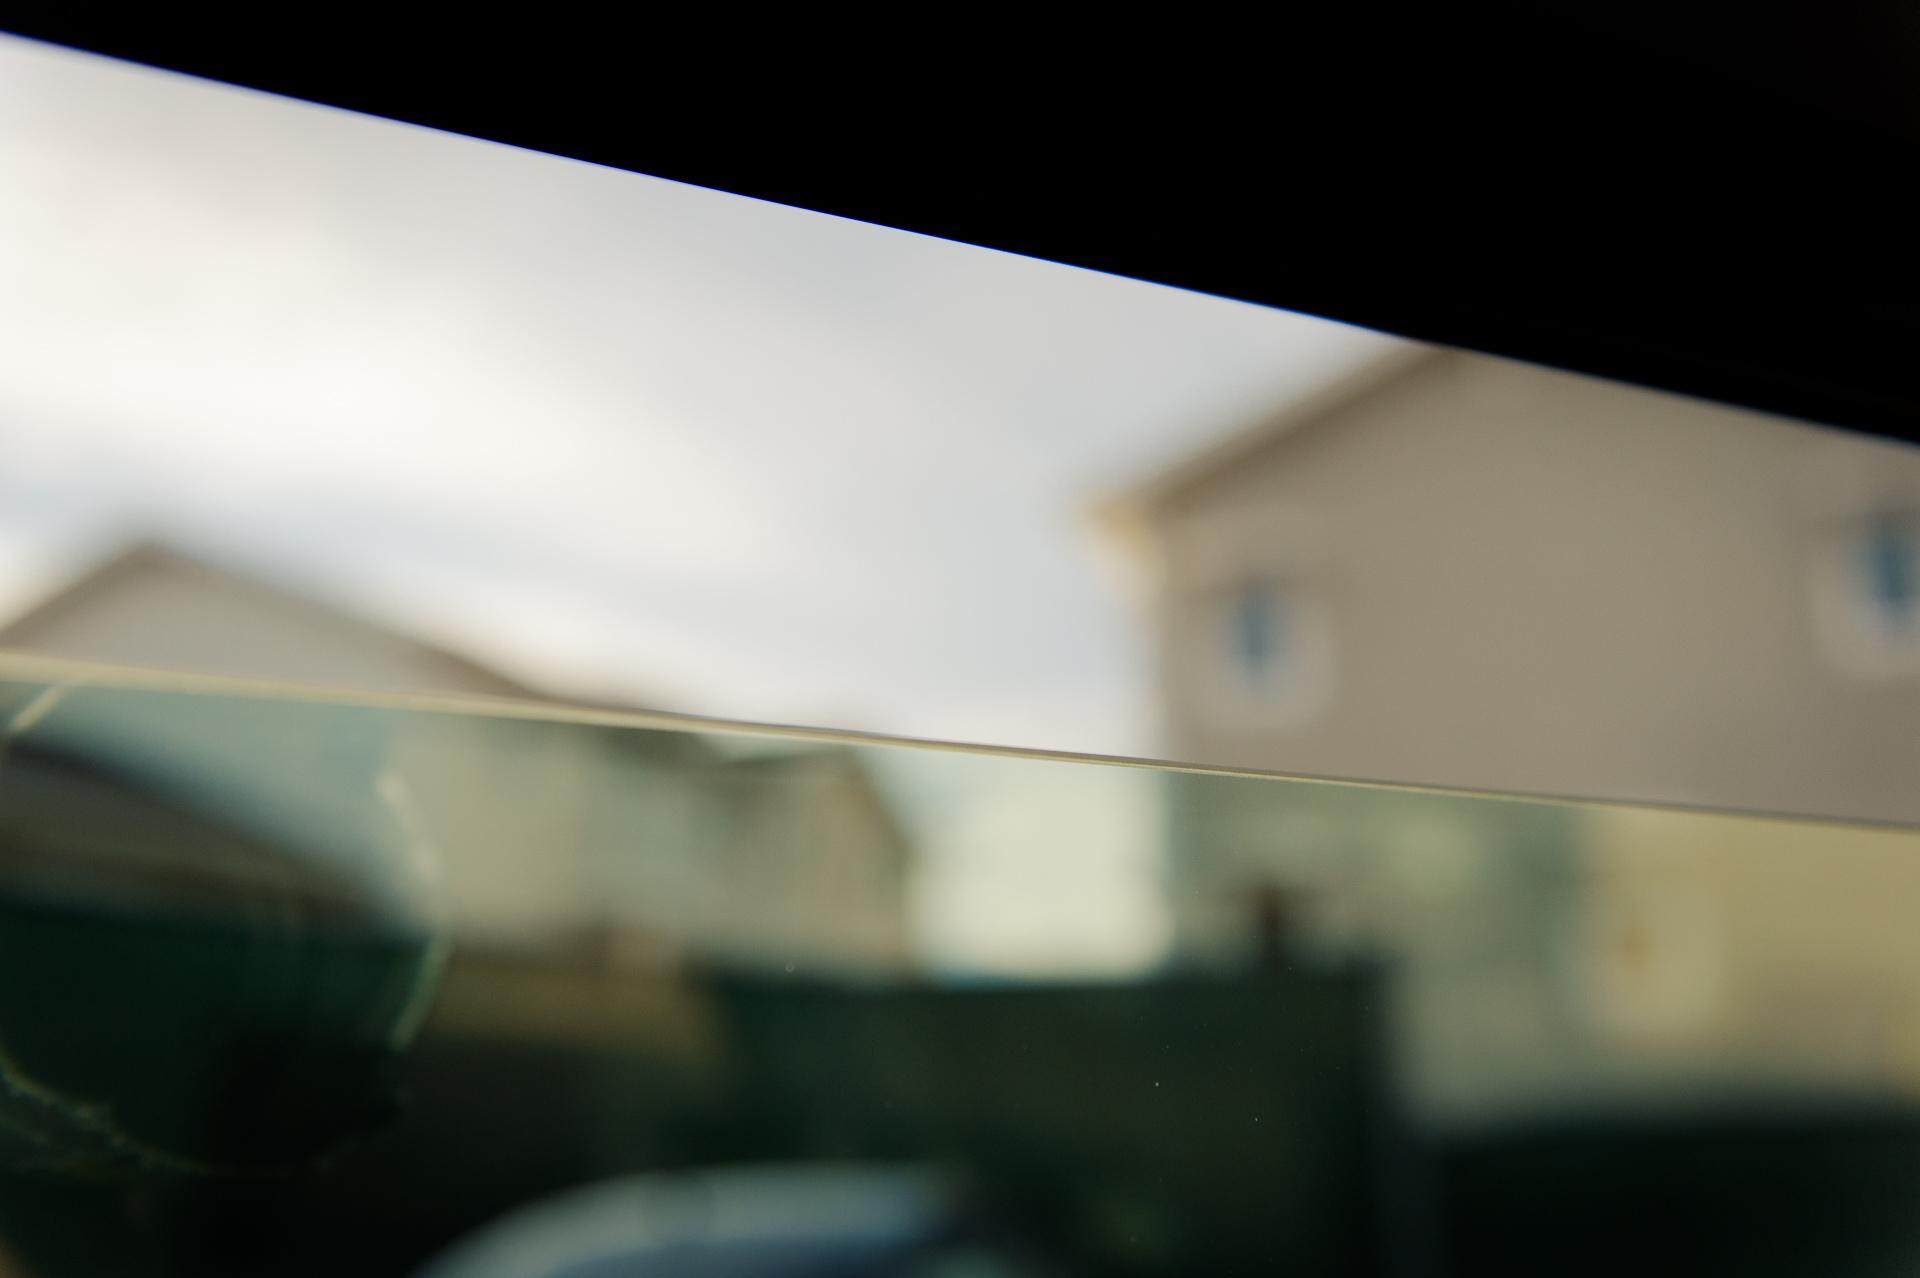 2014-Mercedes-Benz-G500-G550-braun-Kalifornien-mbrt14-44